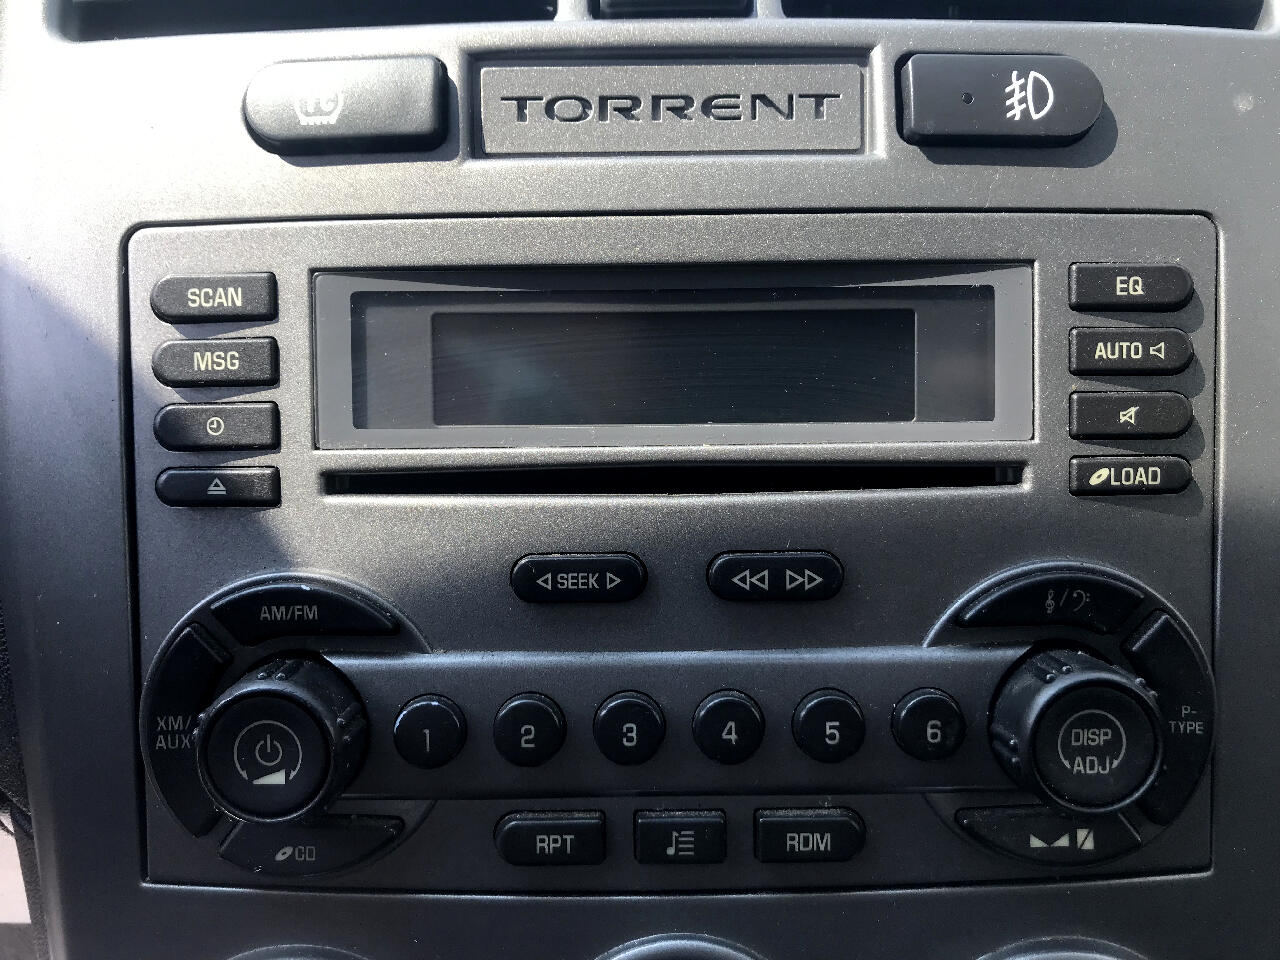 Pontiac Torrent FWD 4dr 2006